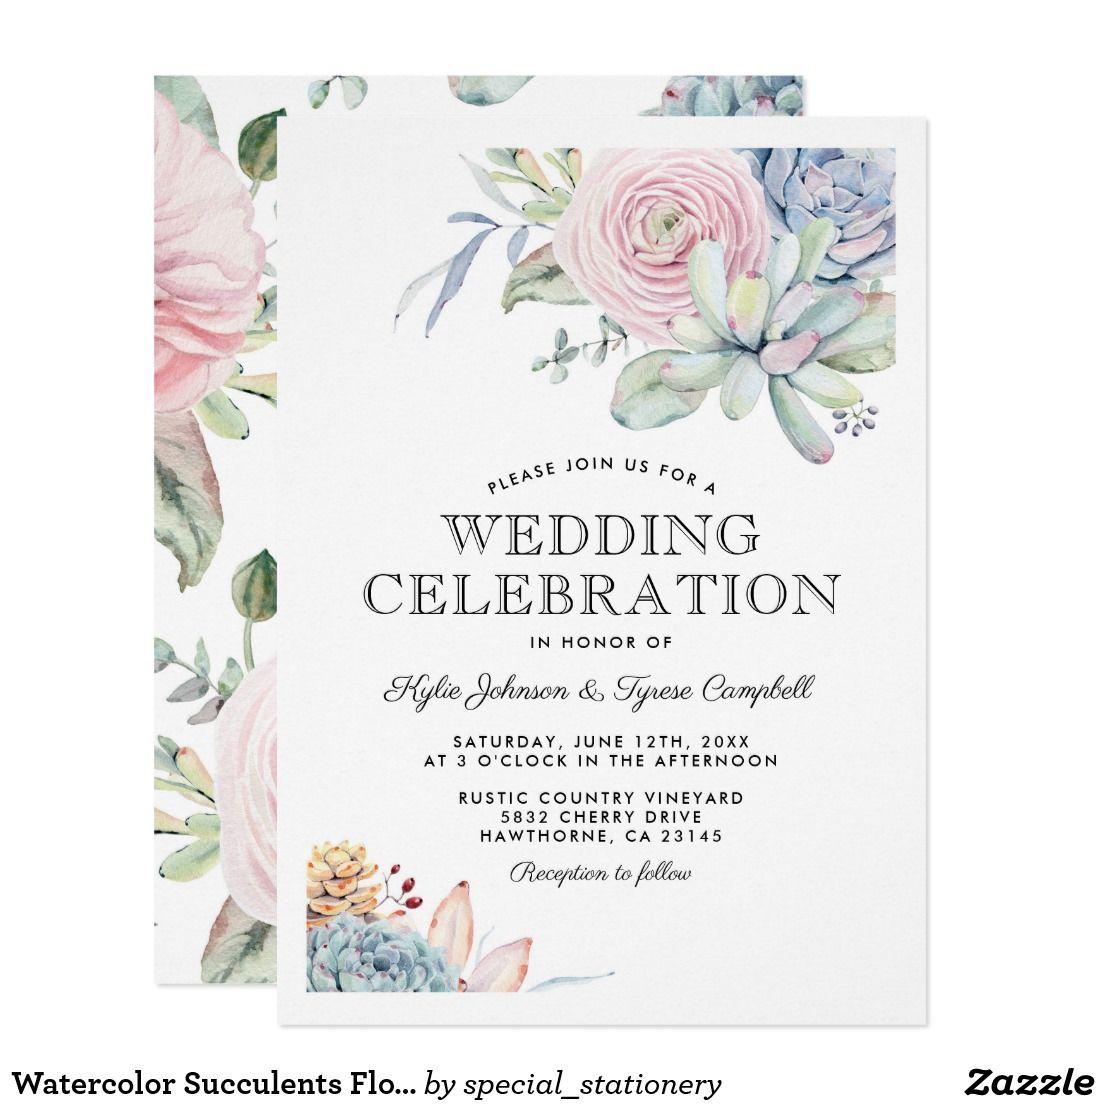 Watercolor Succulents Floral Bloom Vintage Wedding Card | Theme ...